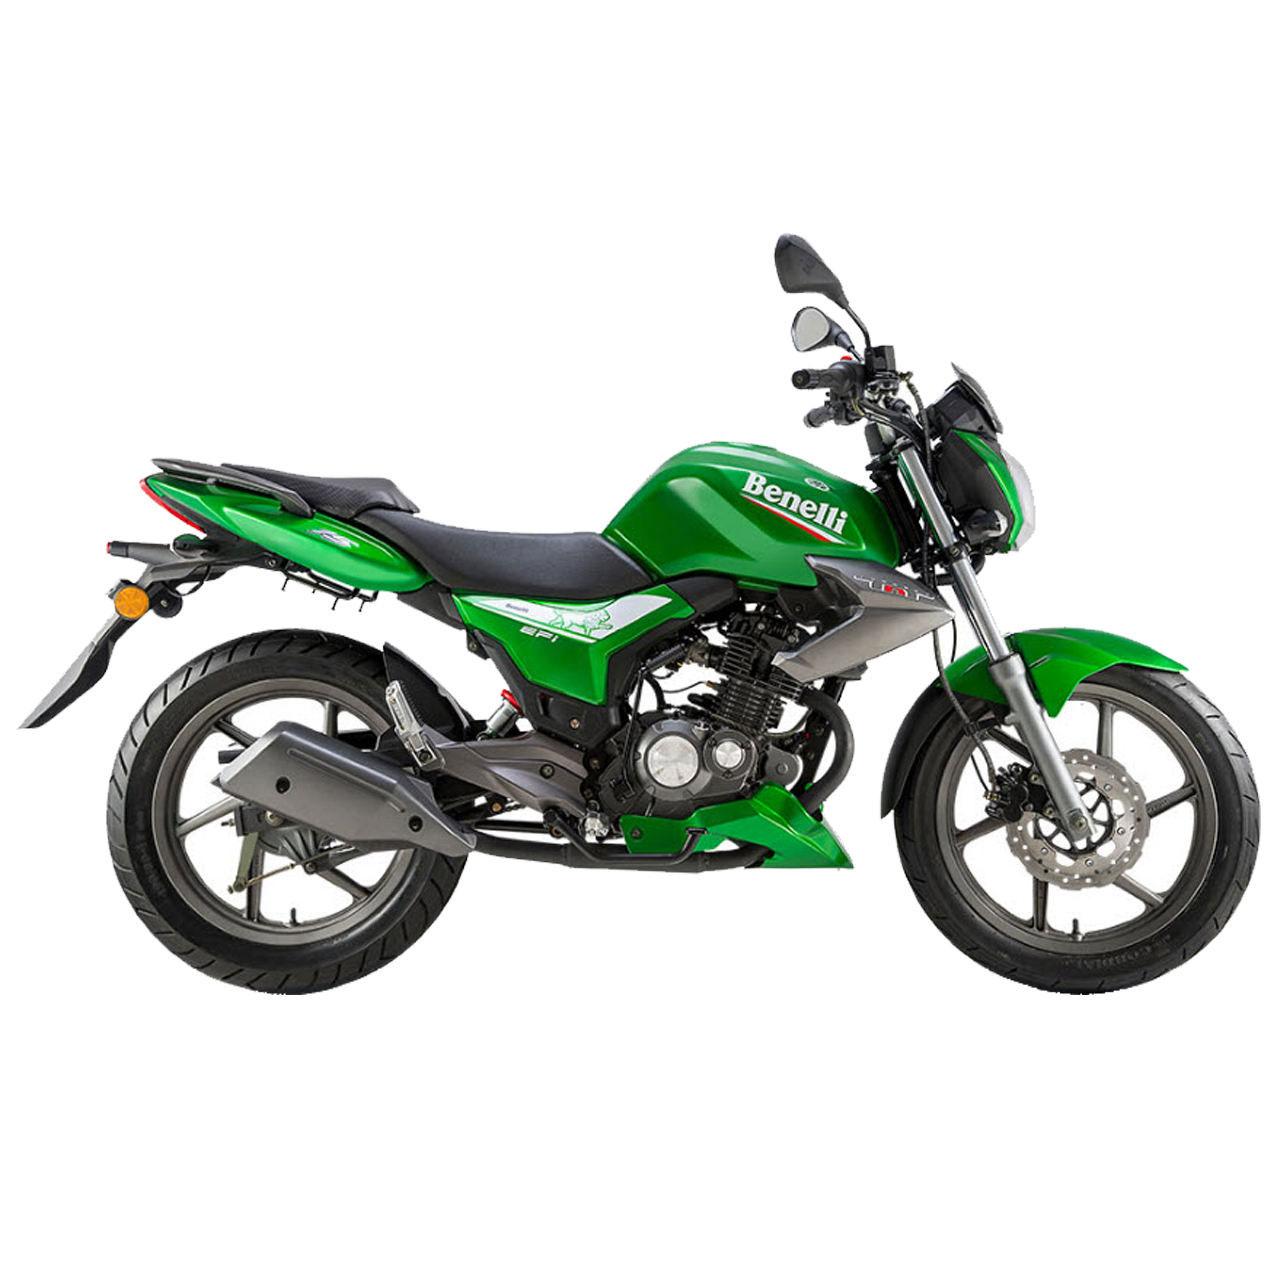 موتورسیکلت بنلی مدل تی ان تی 150 سی سی سال 1399 main 1 5